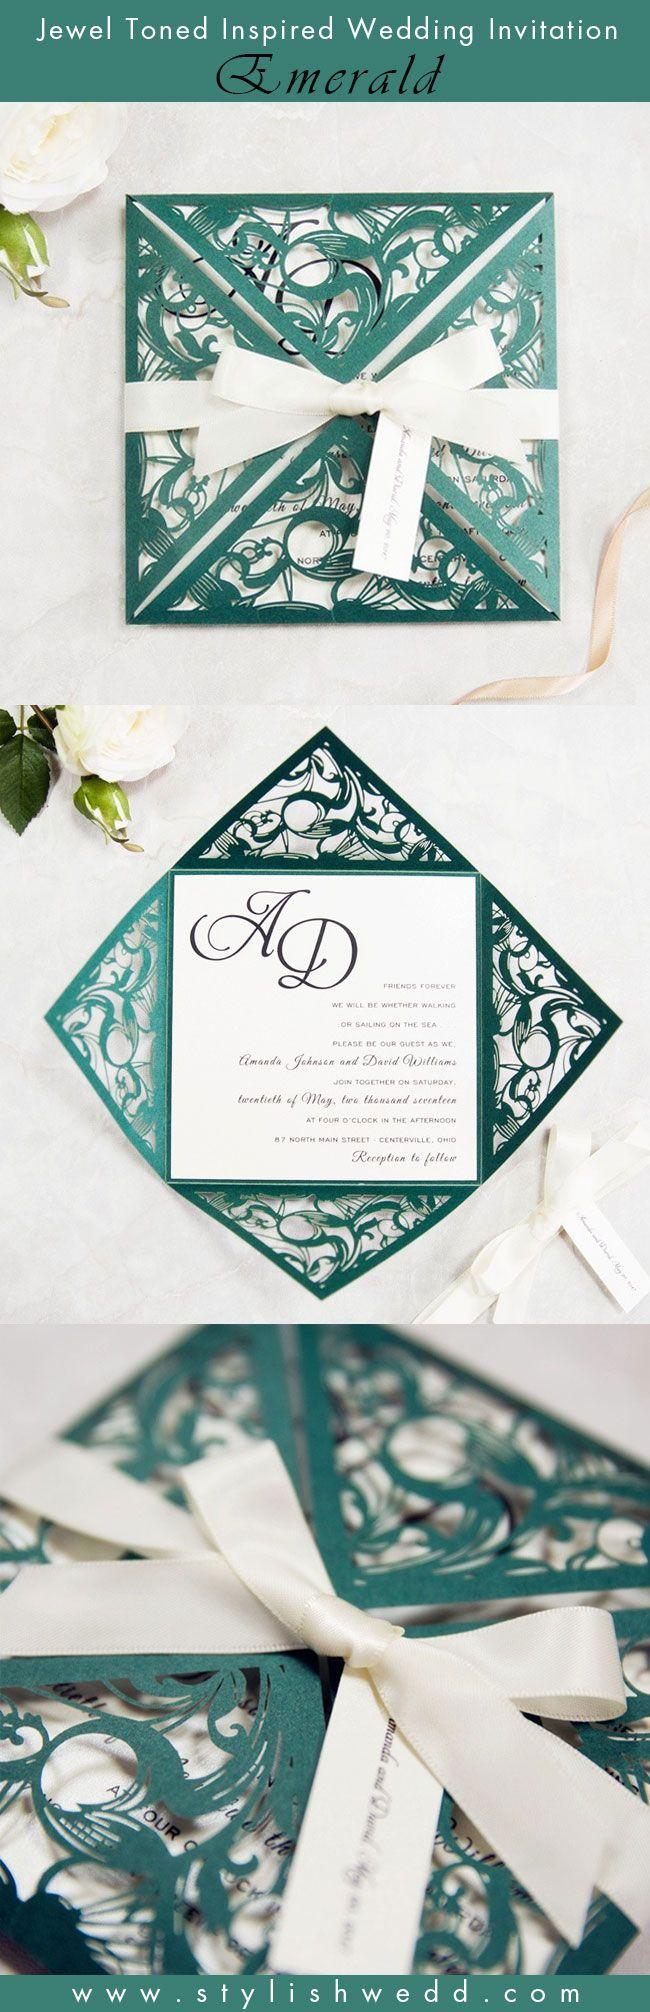 14 best Wedding Invitation images on Pinterest | Invitation cards ...